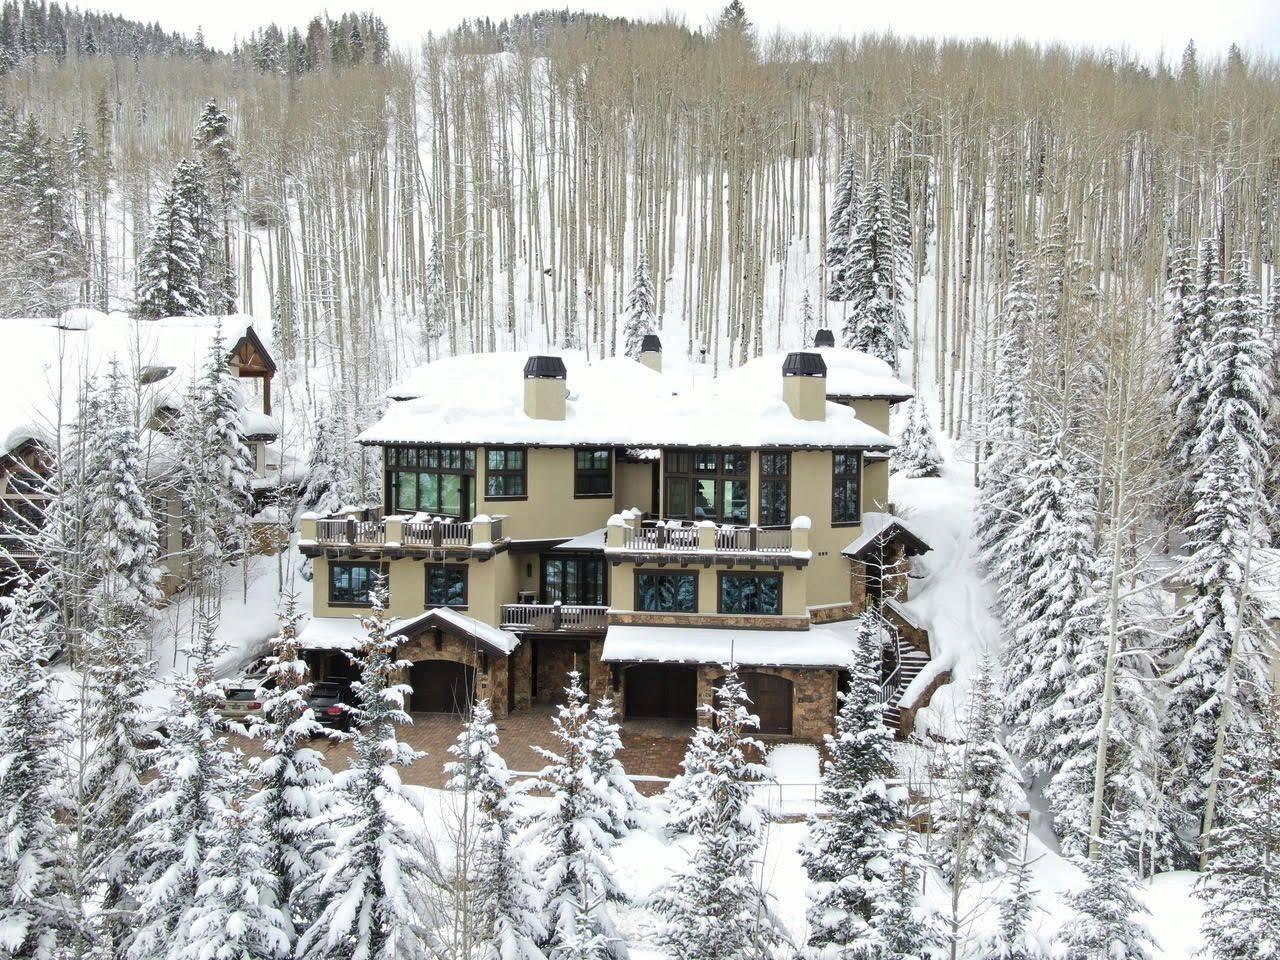 Triumph Mountain Luxury Vacation Home Lionshead Village Vail Valley Colorado